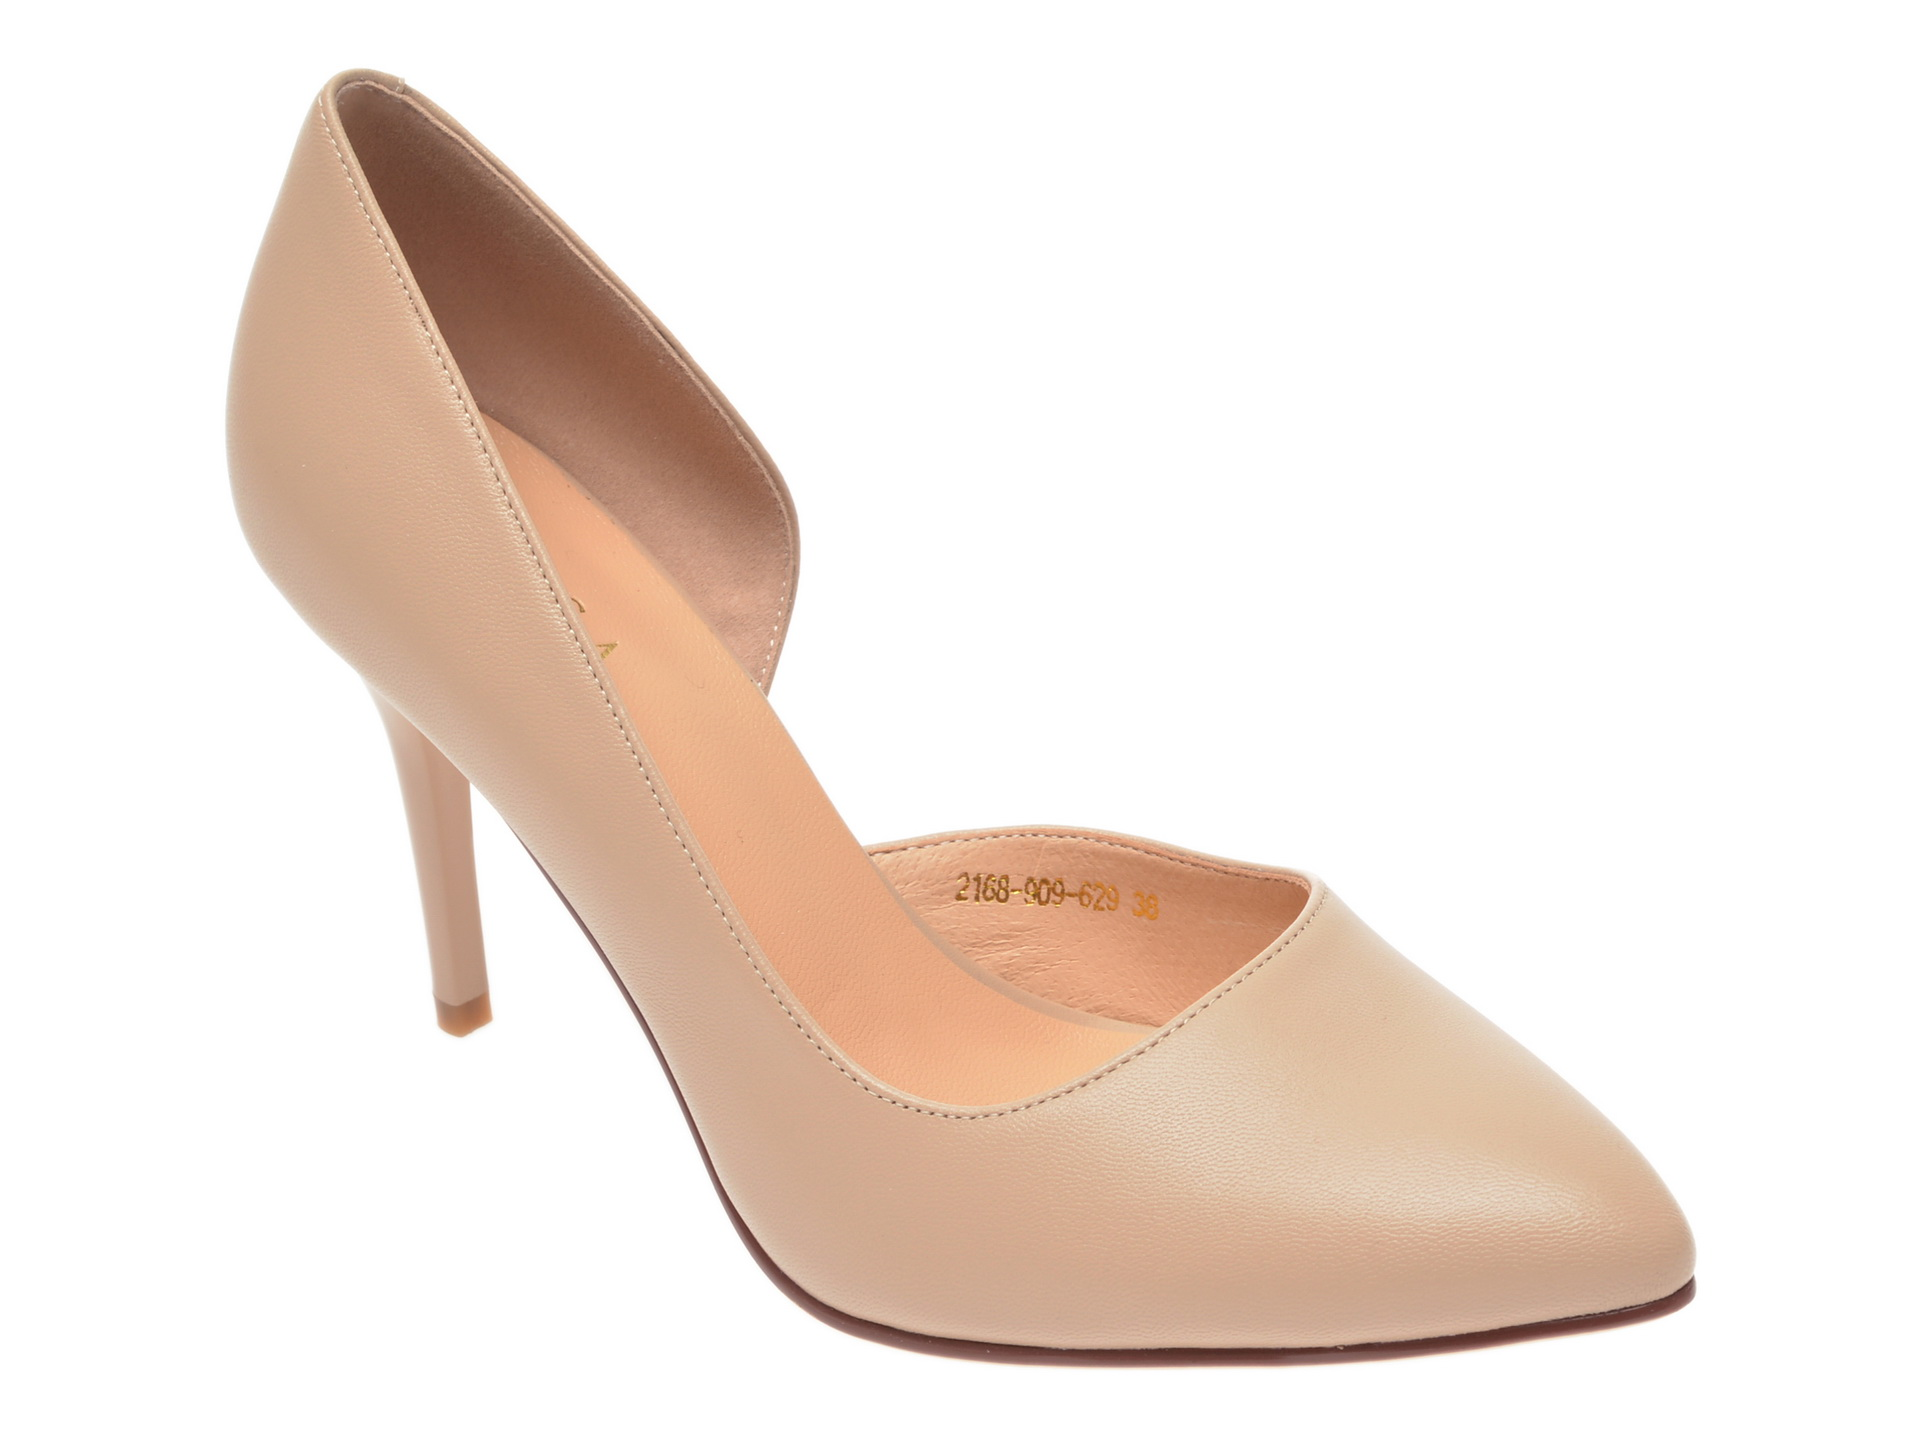 Pantofi EPICA bej, 2168909, din piele naturala New